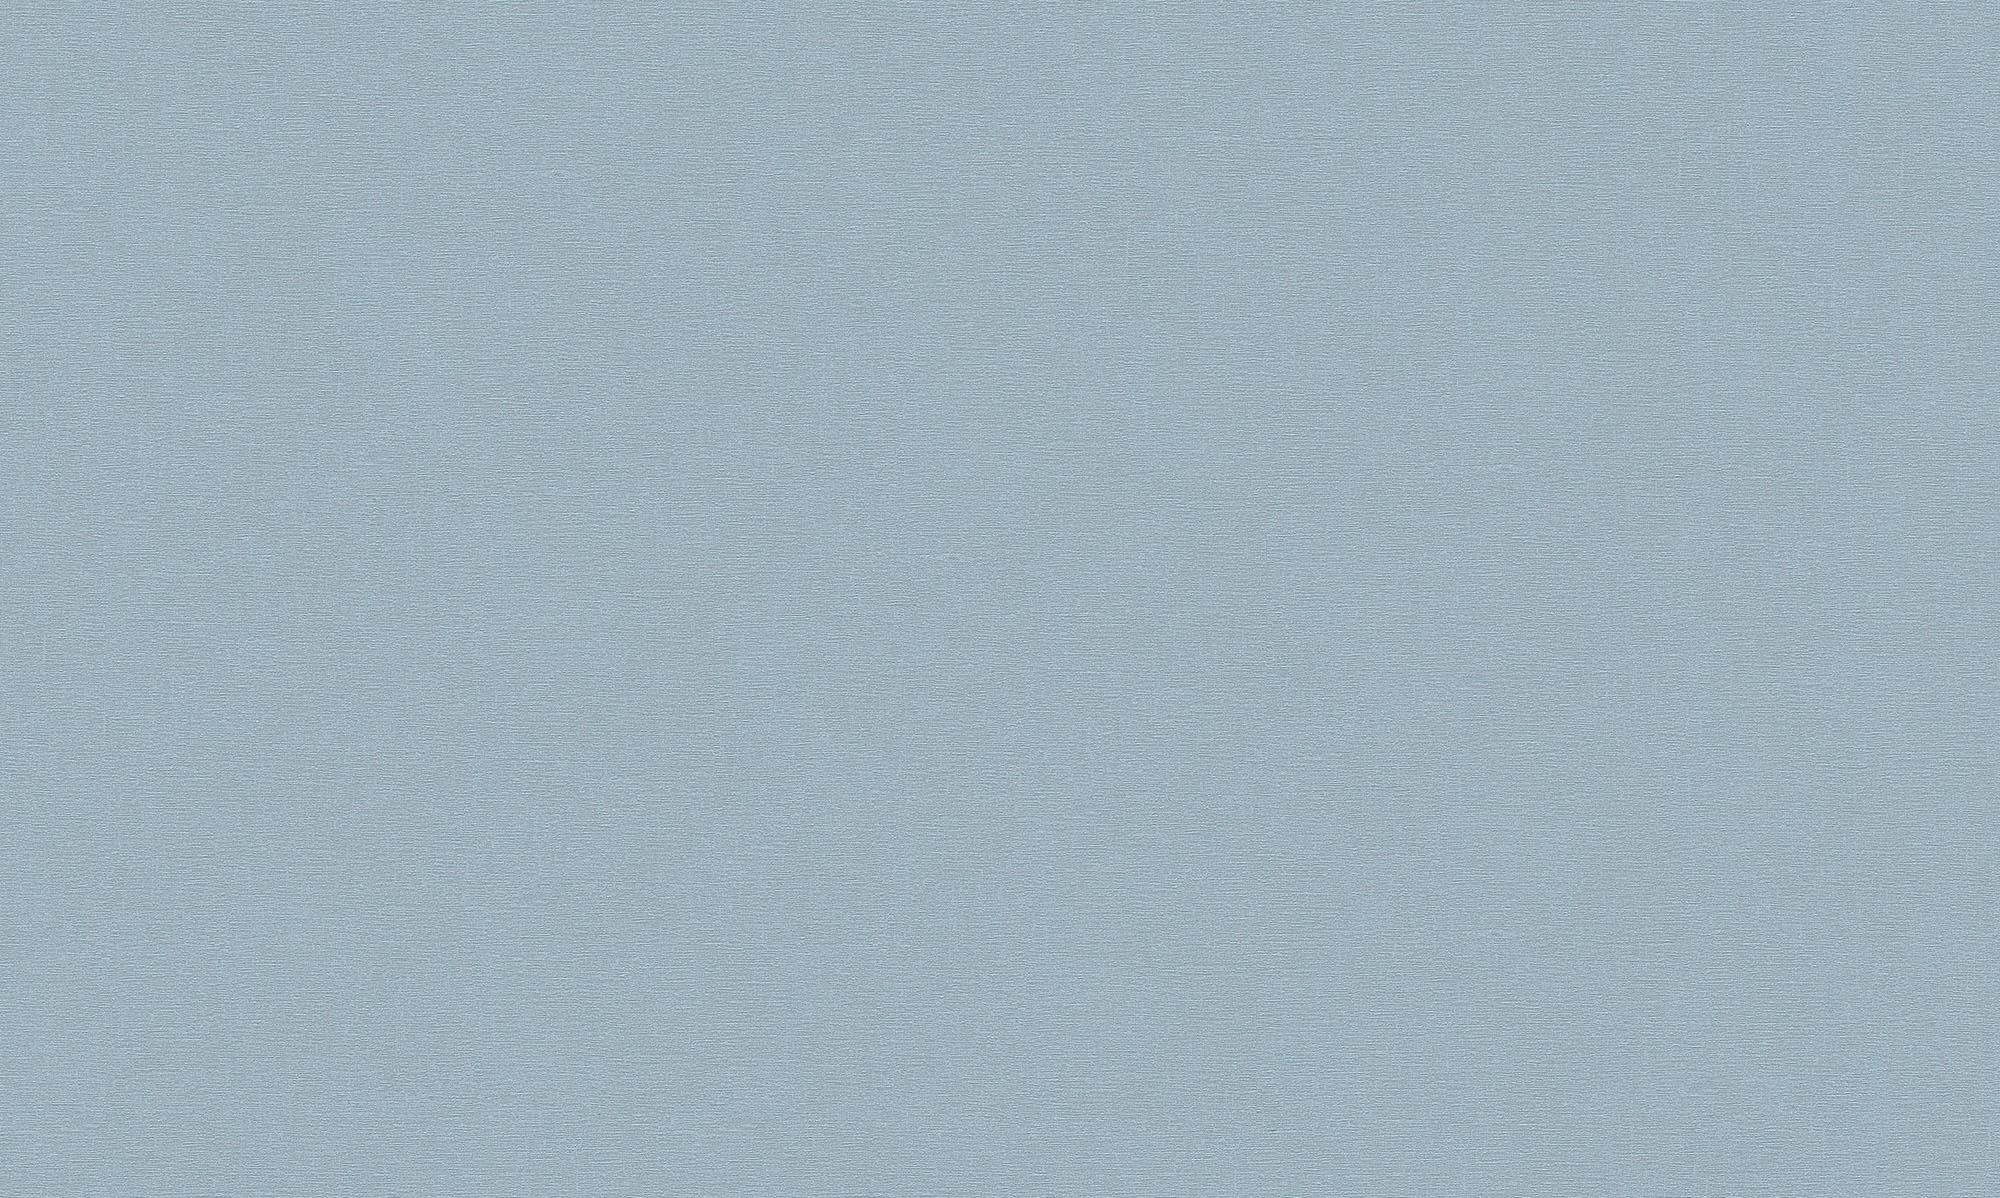 NEWROOM Vliestapete Blau Muster  Natur Vlies Metallic Grafik 3D Optik Vlies Tape